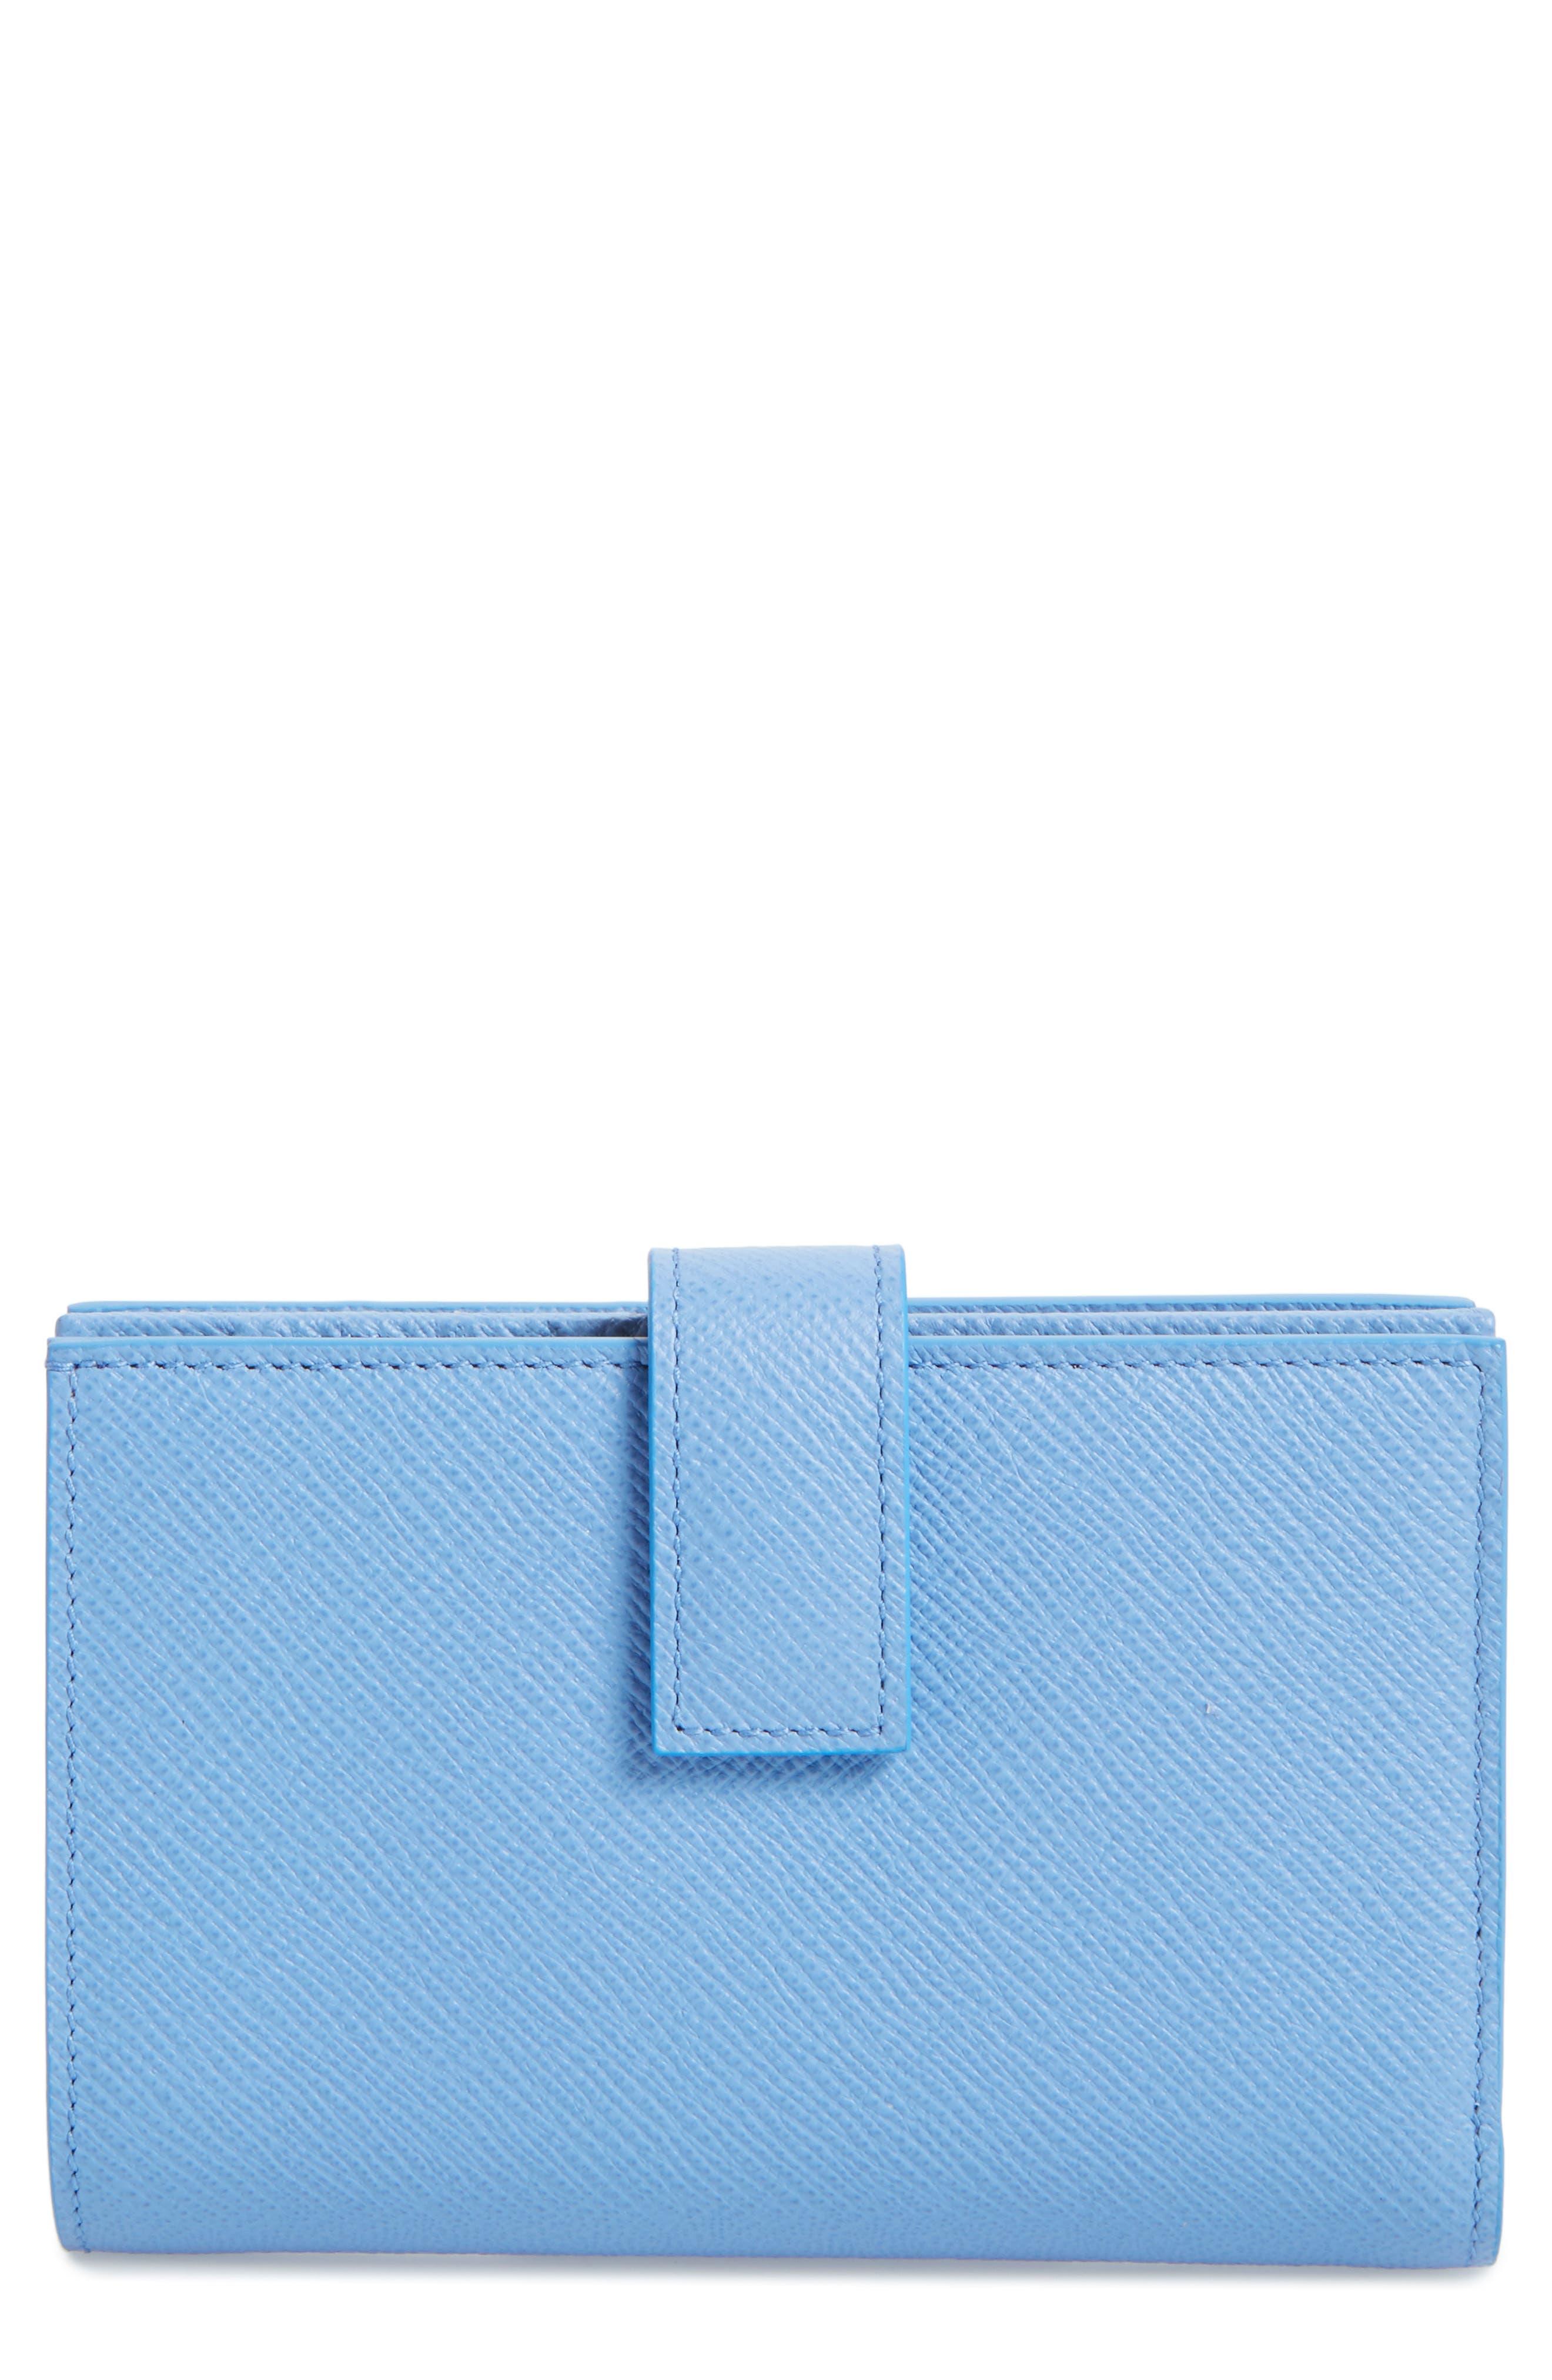 Alternate Image 1 Selected - Smythson 'Medium' Continental Wallet